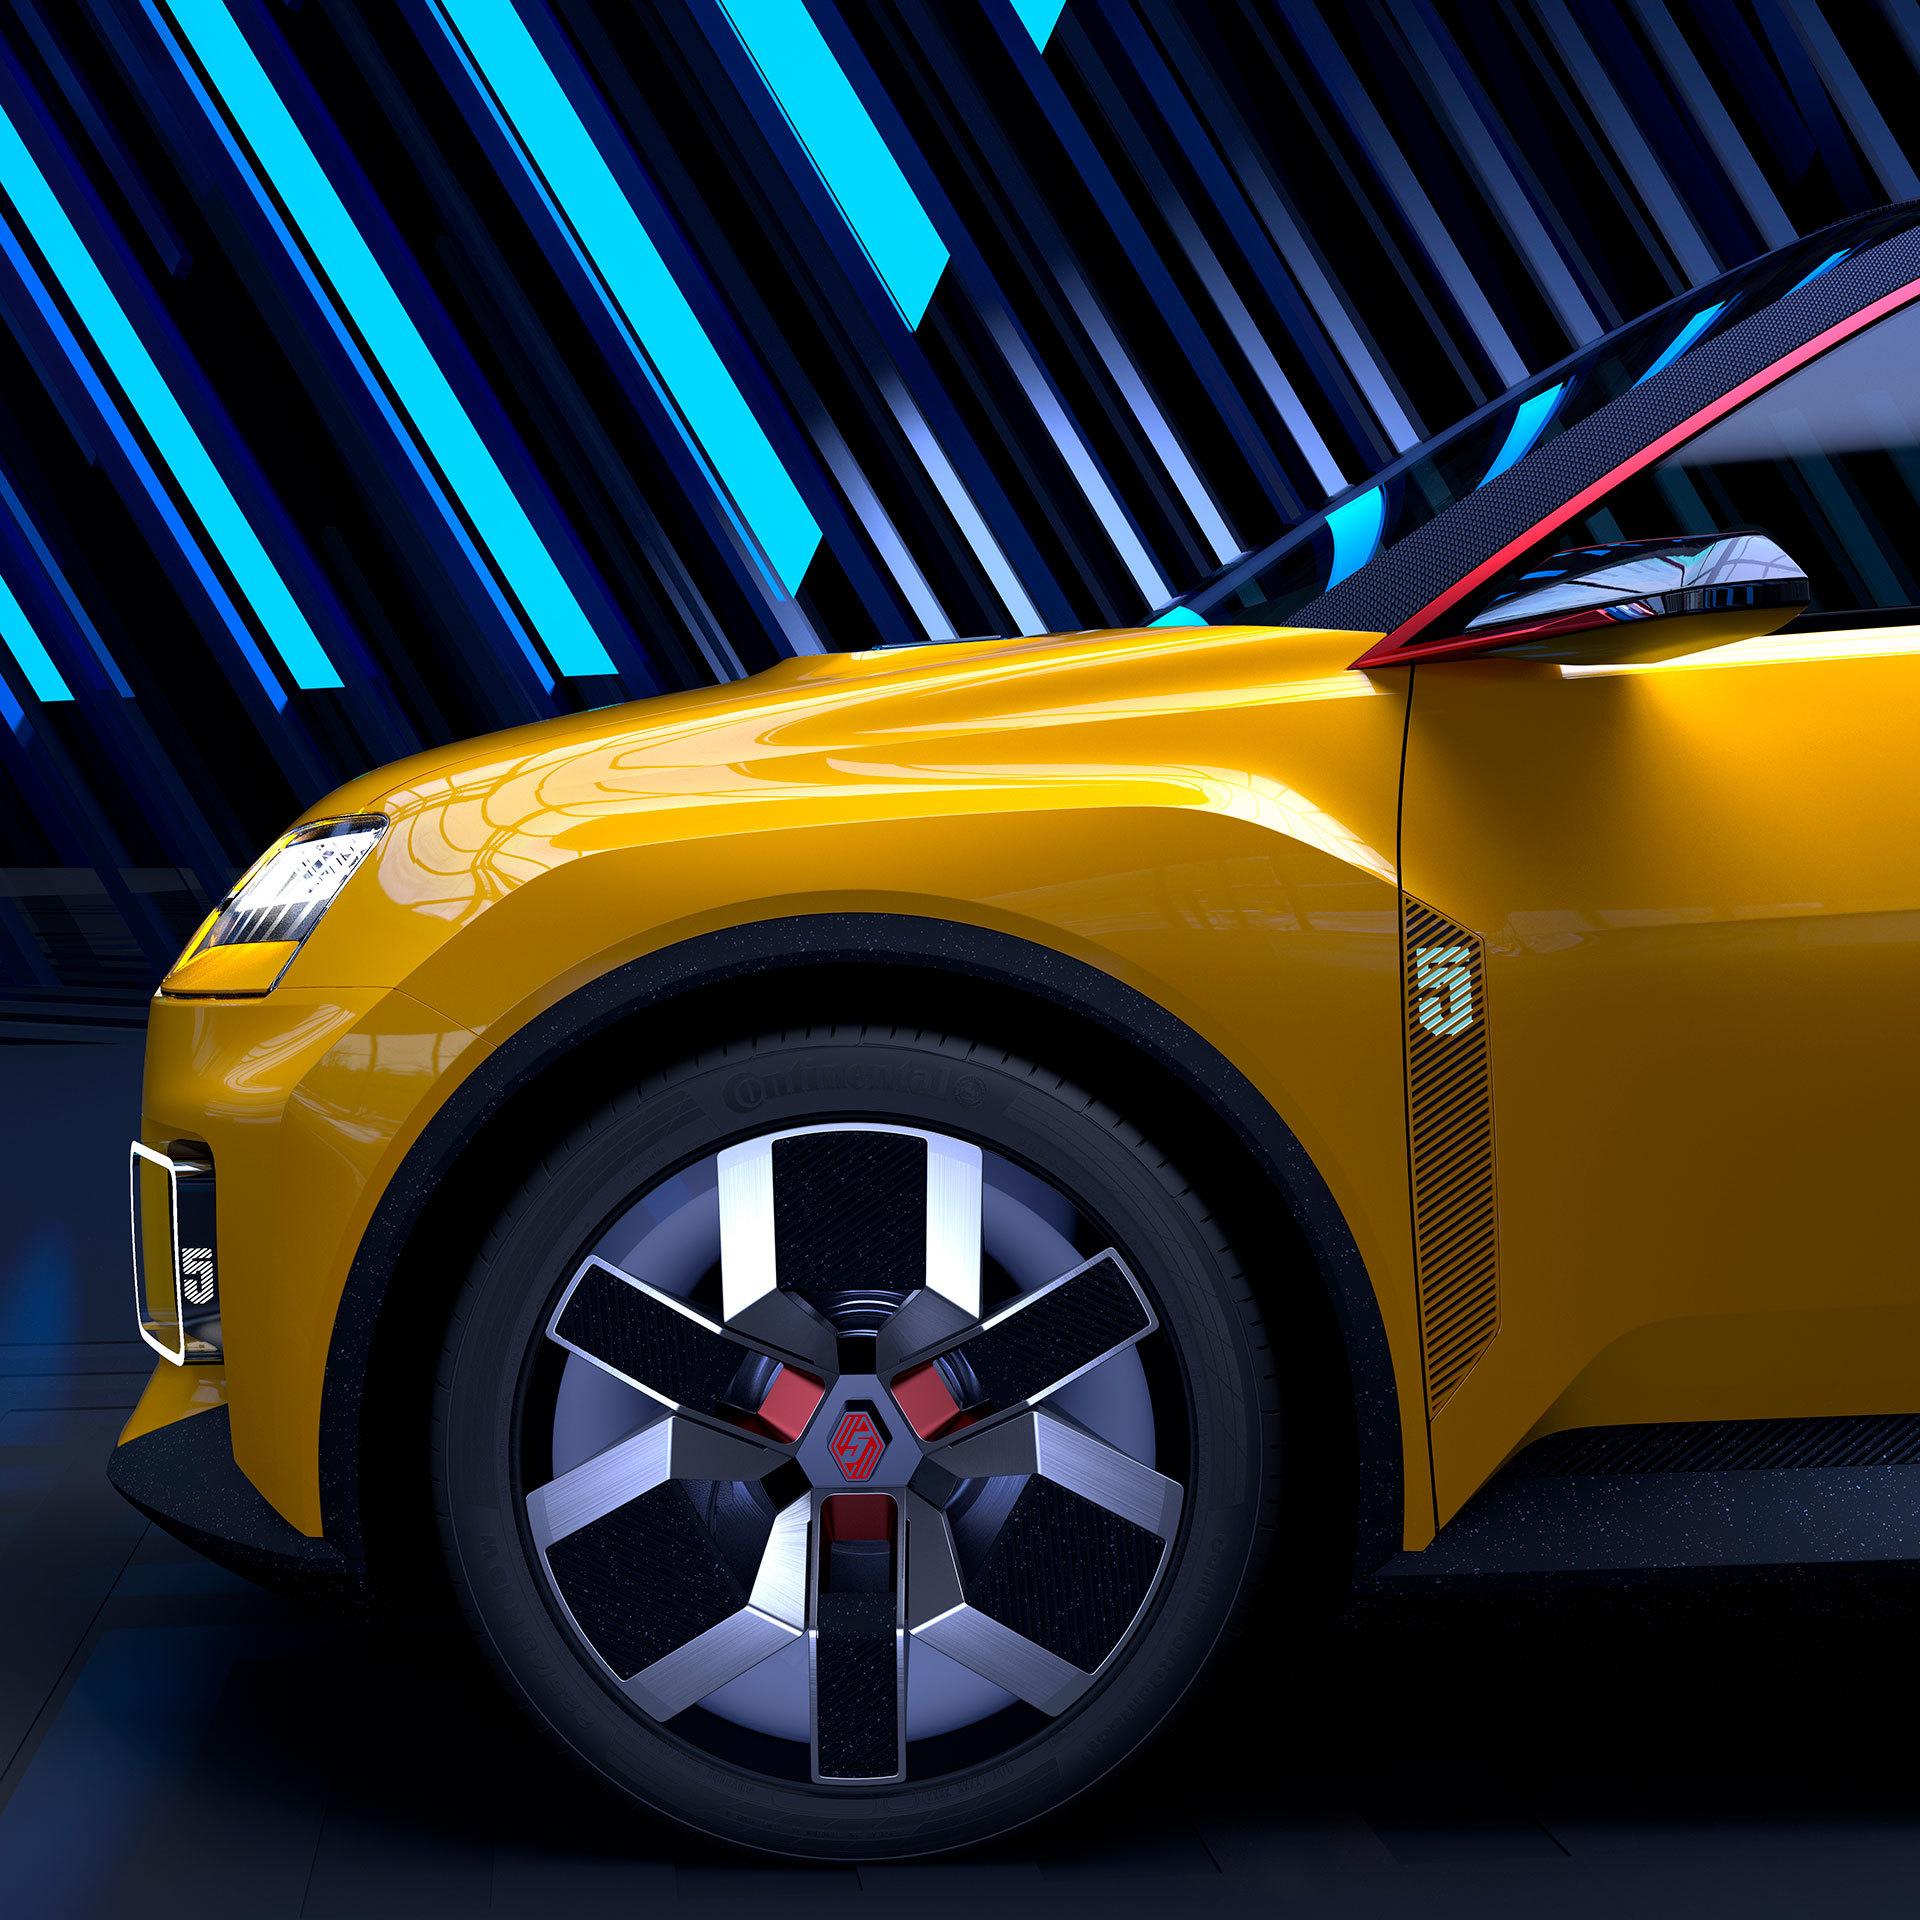 Nuevo Renault 5 Revolucion 2025 01